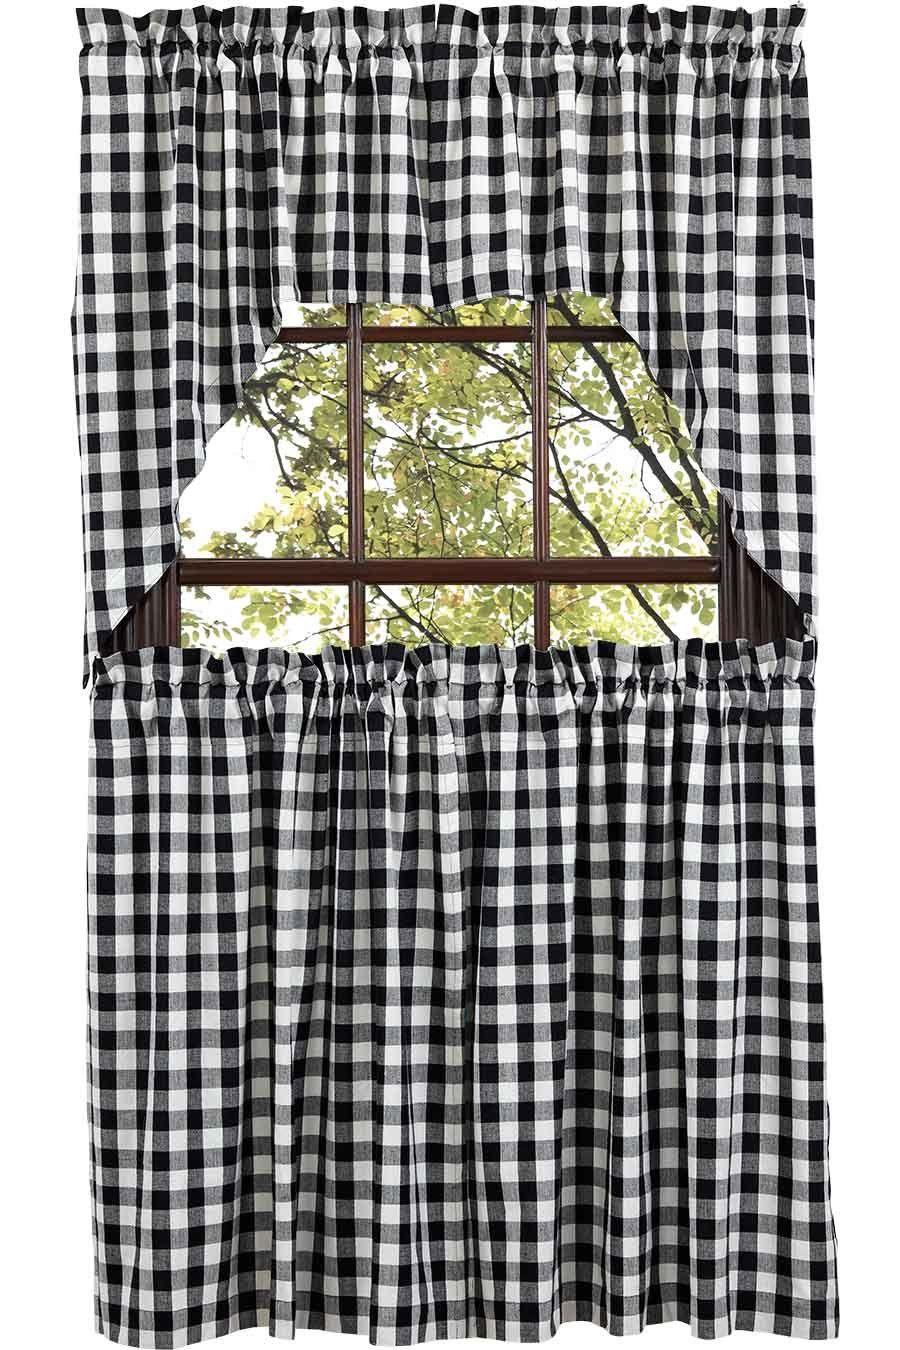 Rustic kitchen window decor  amazon buffalo black check swag set of xx